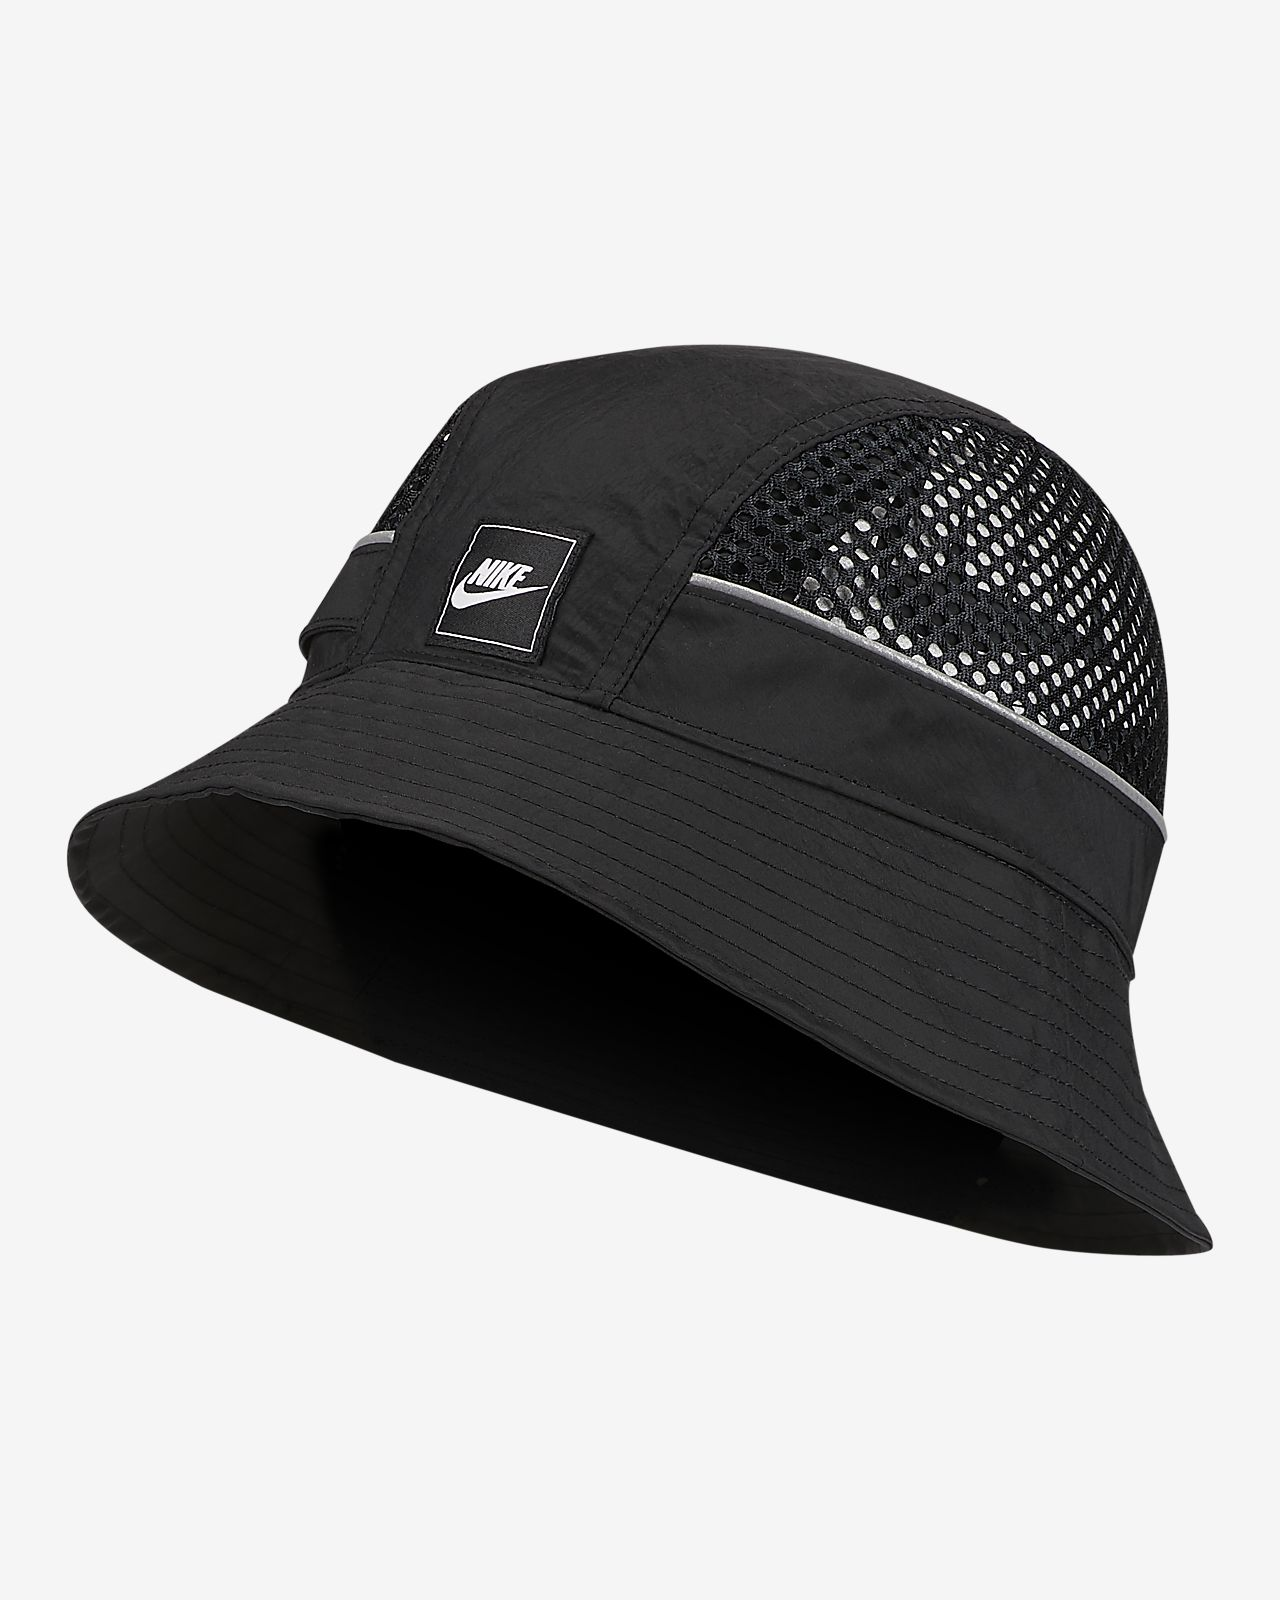 918c1b7172eaa0 Nike Sportswear Mesh Bucket Hat. Nike.com CA